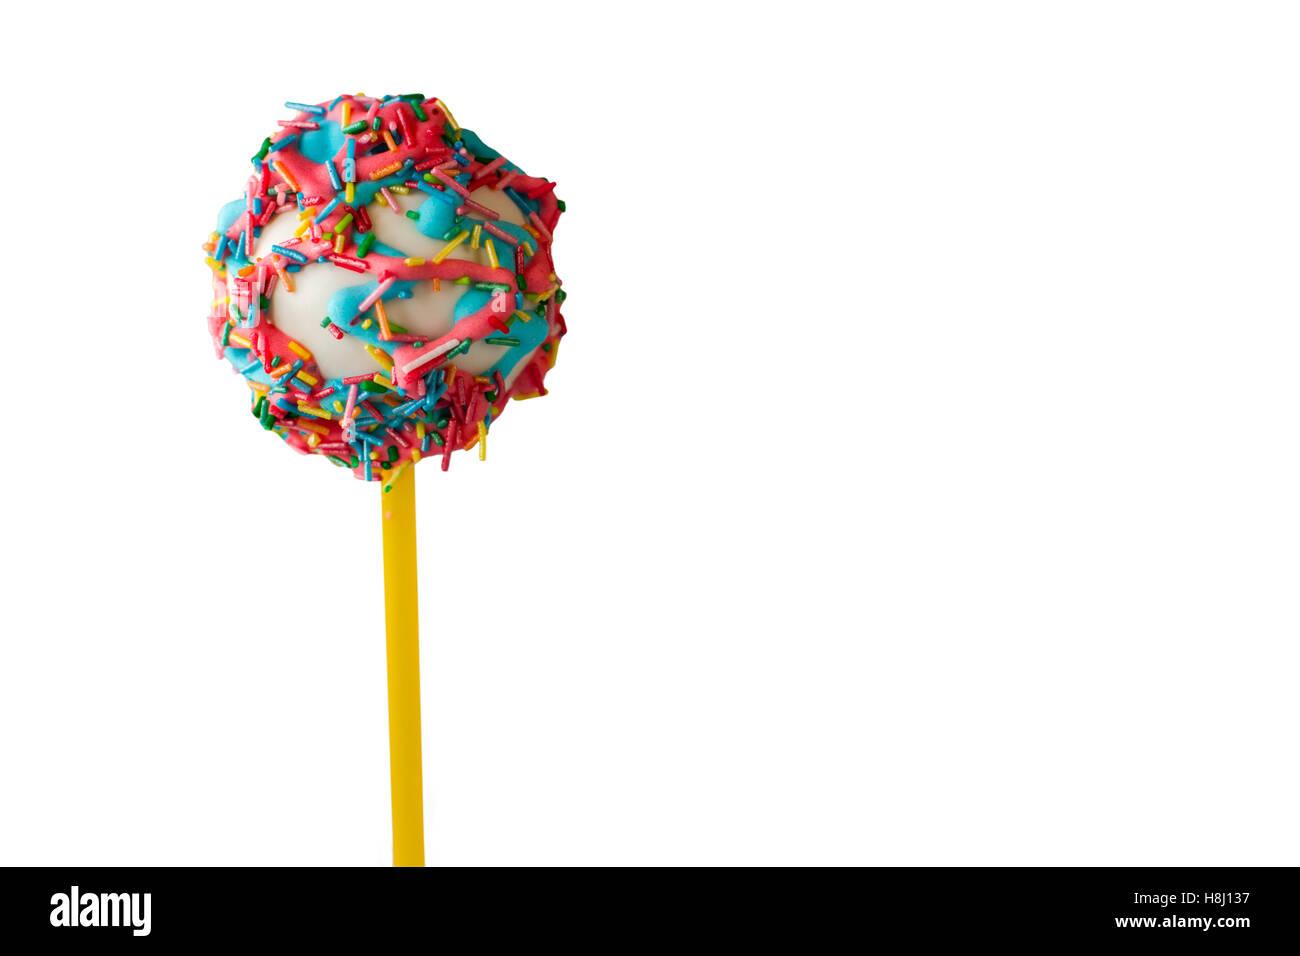 Bright cake lollipop. - Stock Image